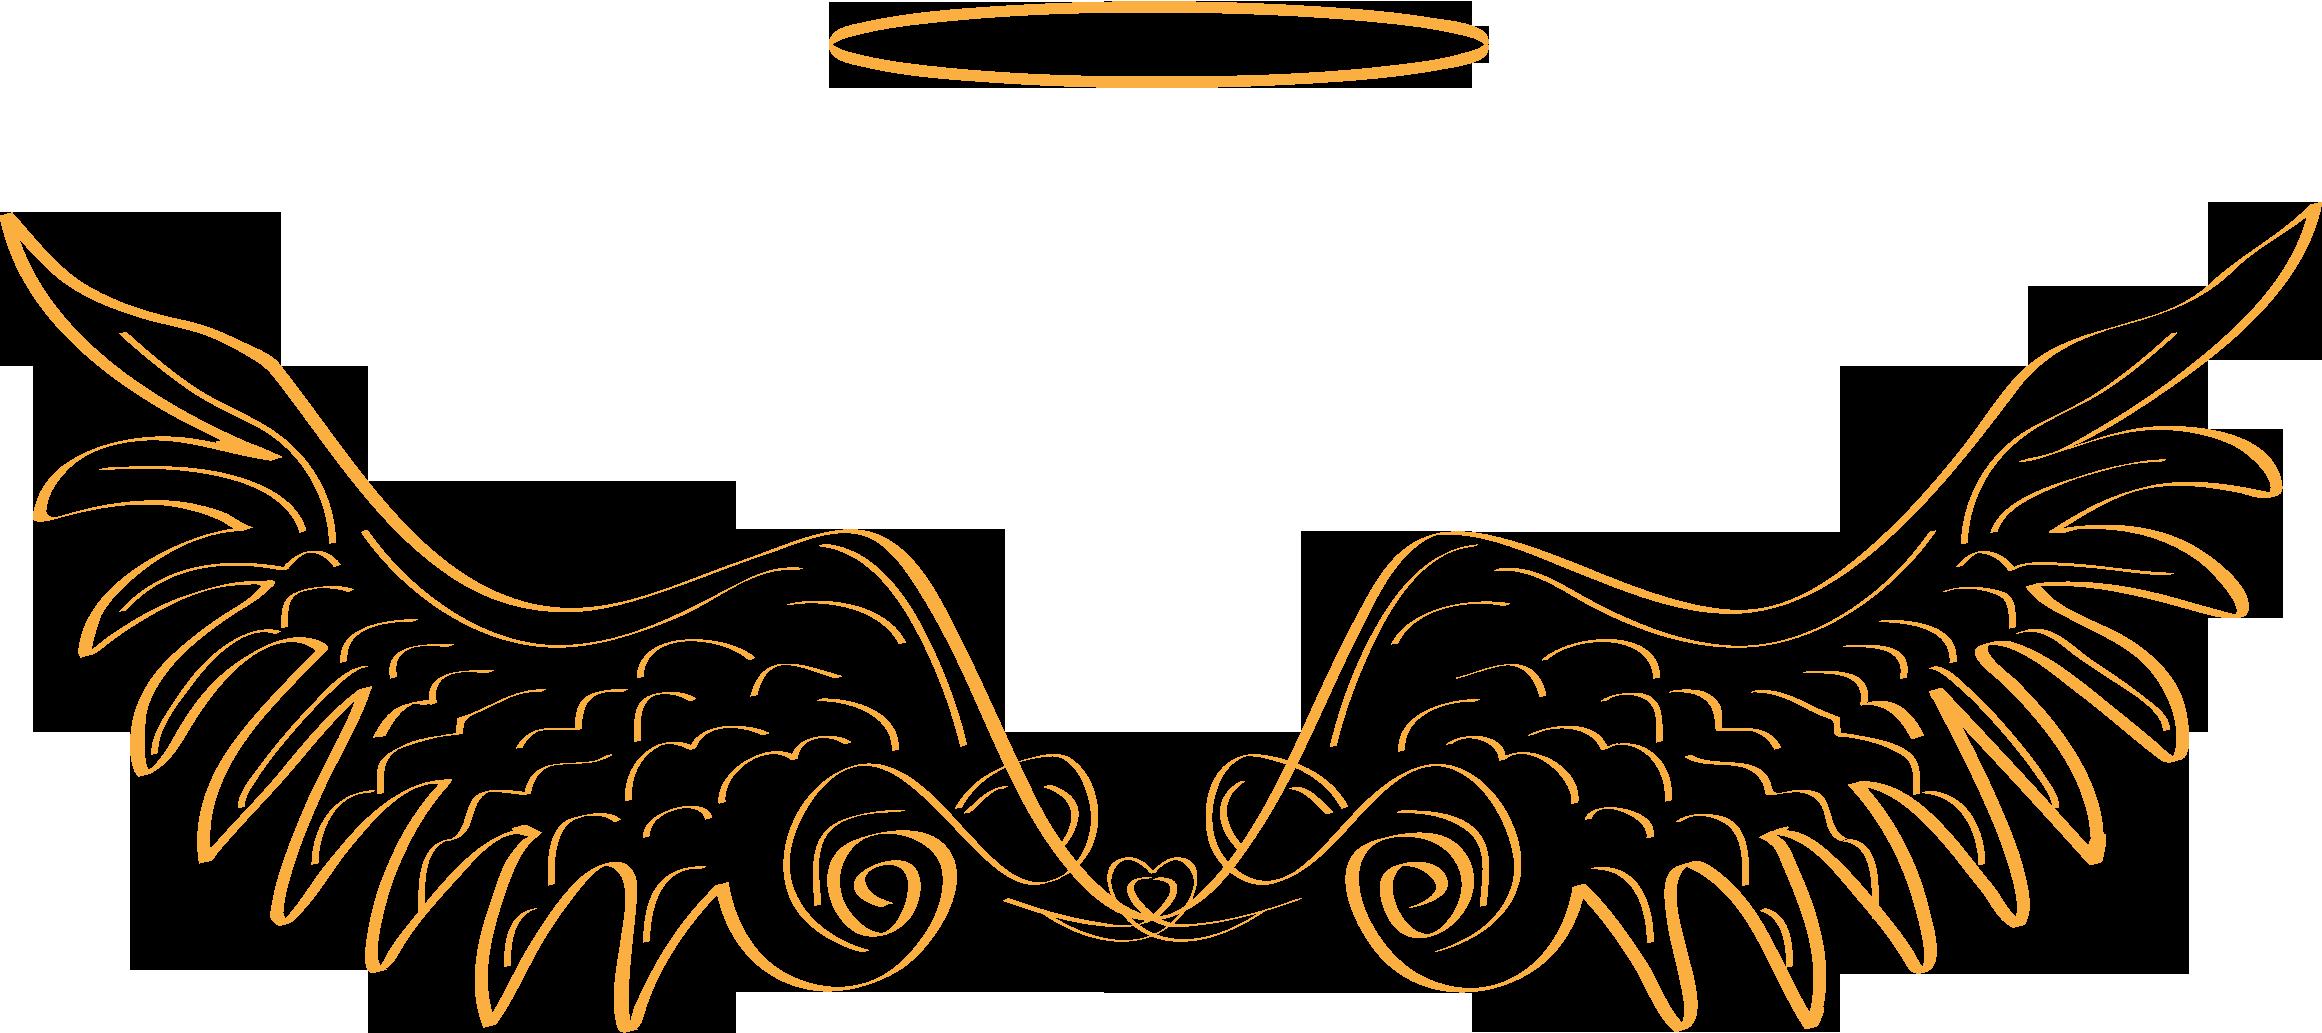 Archangels and devas michael. Wing clipart archangel